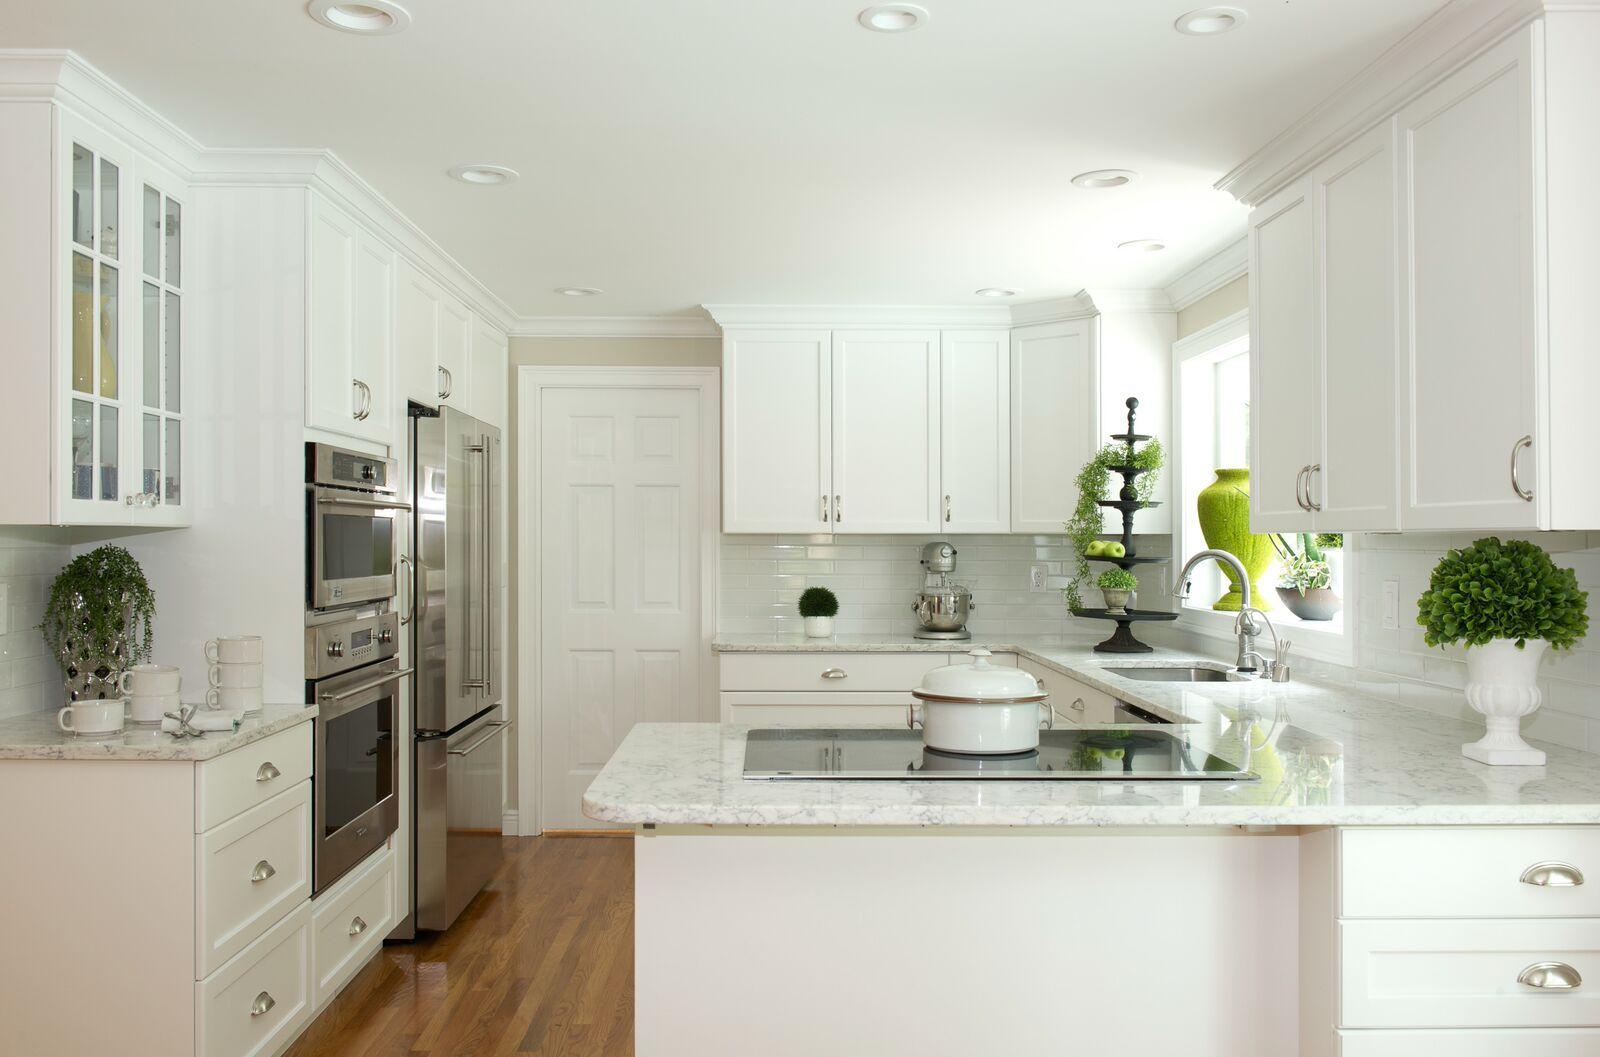 Kitchen Remodel - Taylor Bryan Company Quartz counter top - White ...